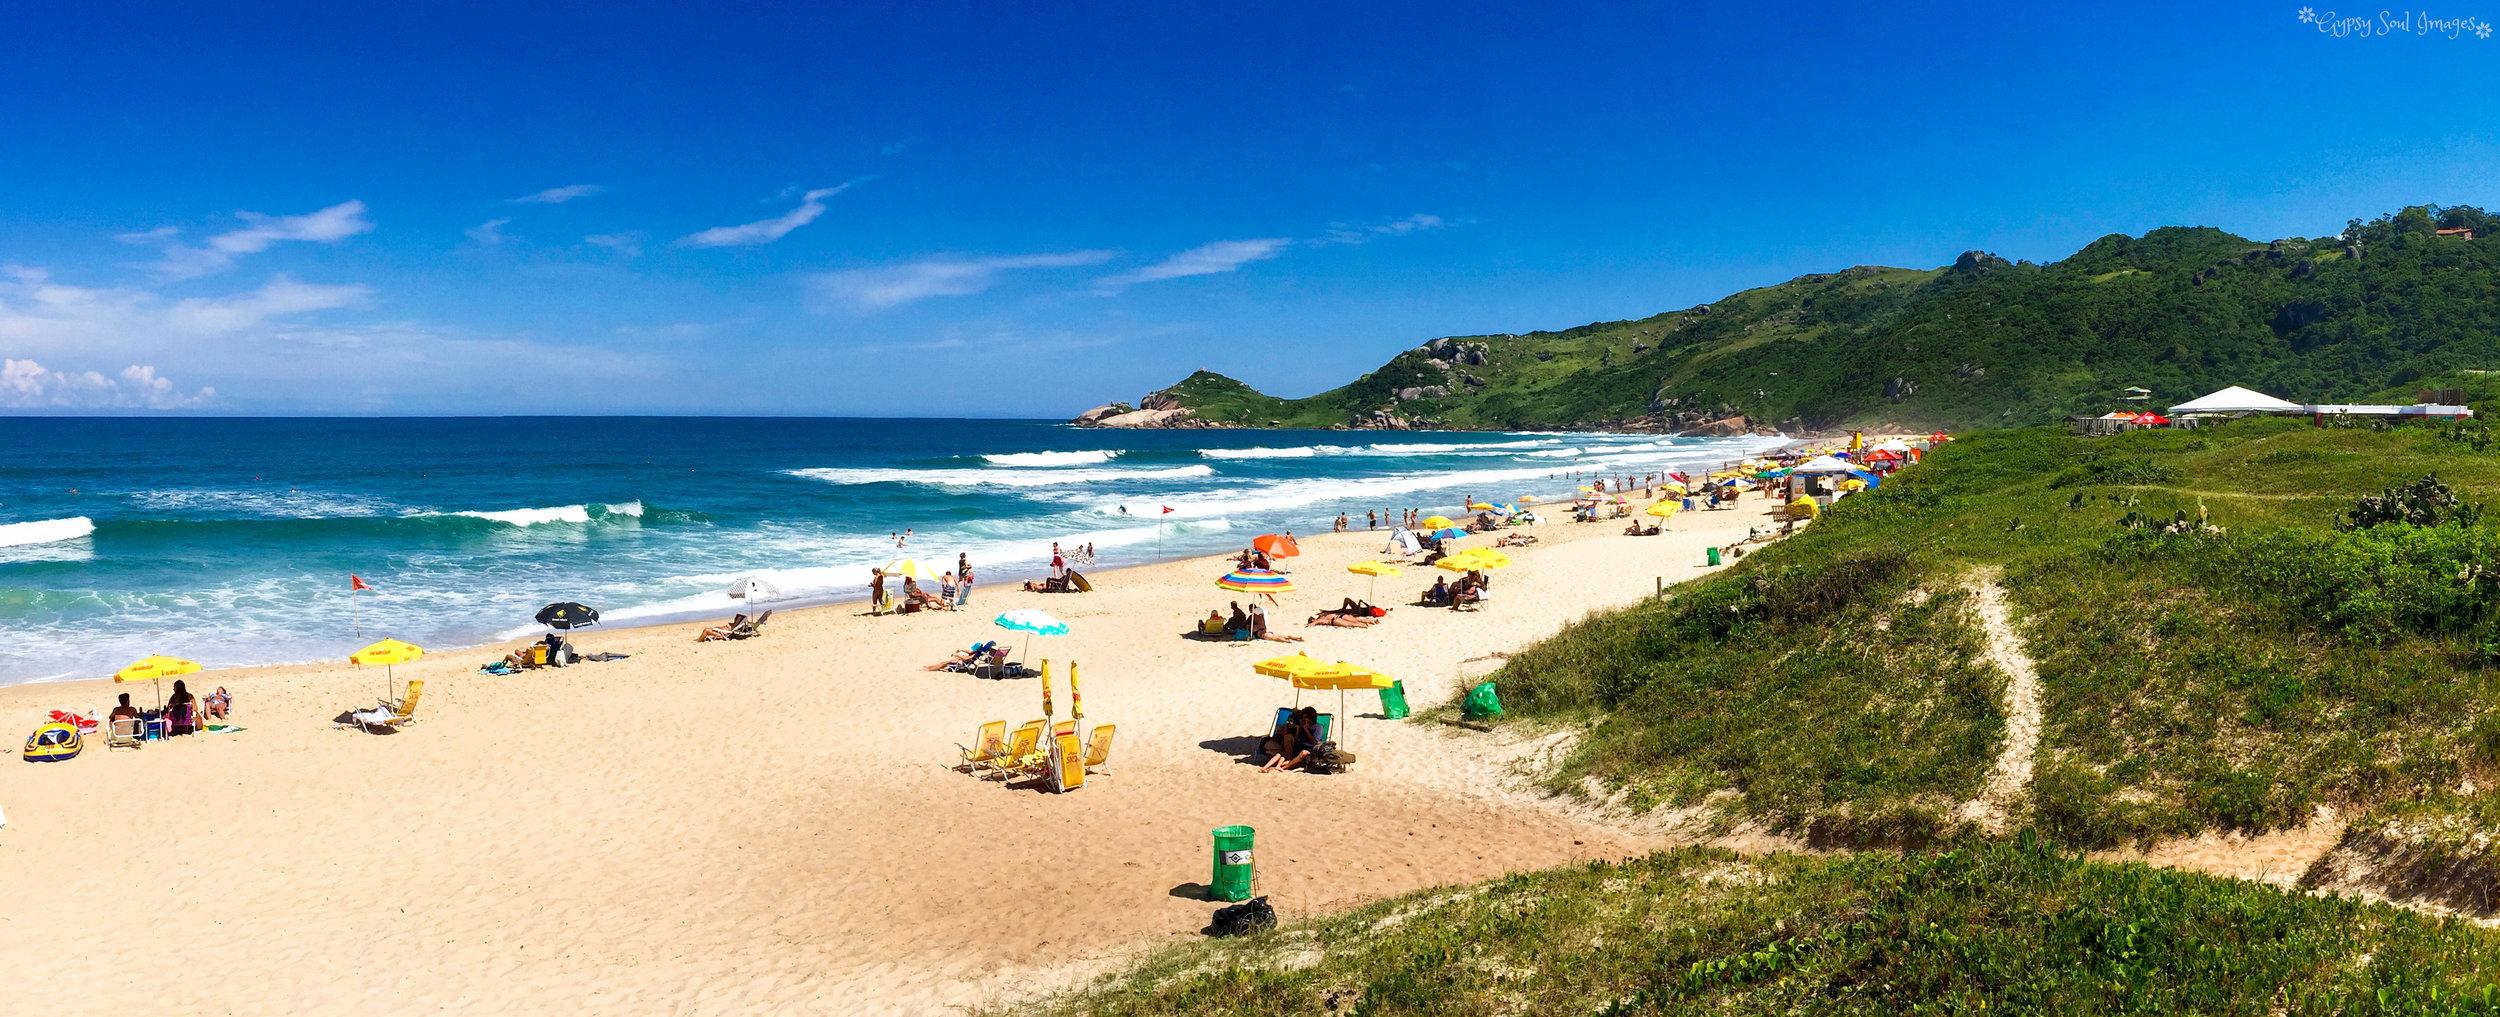 Fun in the Sun - Florianópolis, Brazil